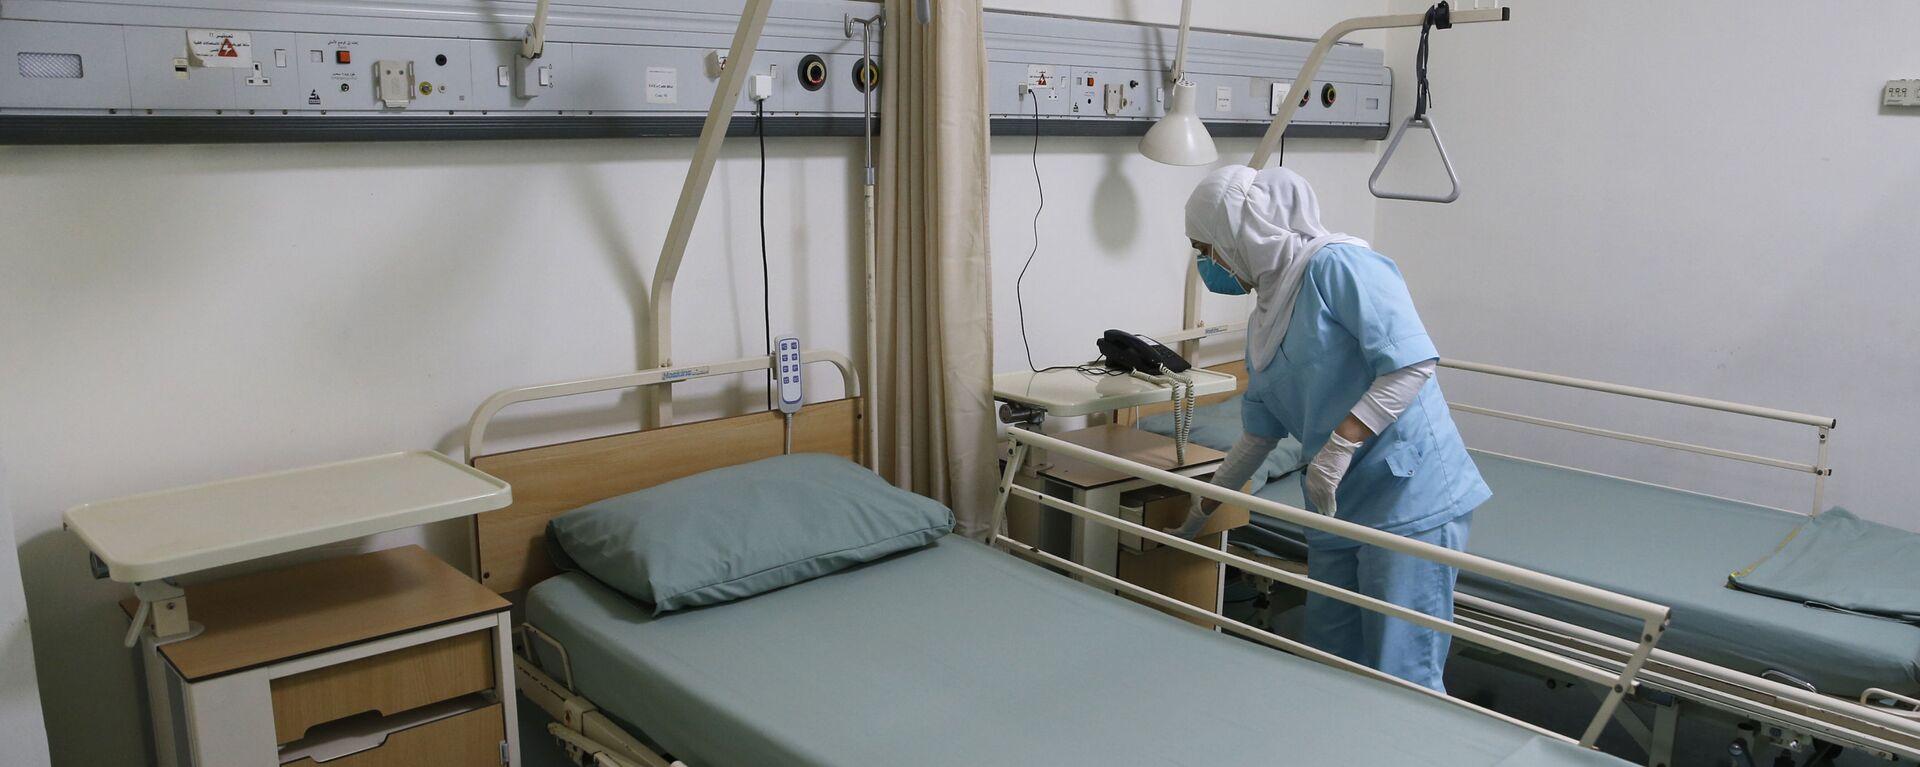 Больница, фото из архива - Sputnik Азербайджан, 1920, 01.04.2021